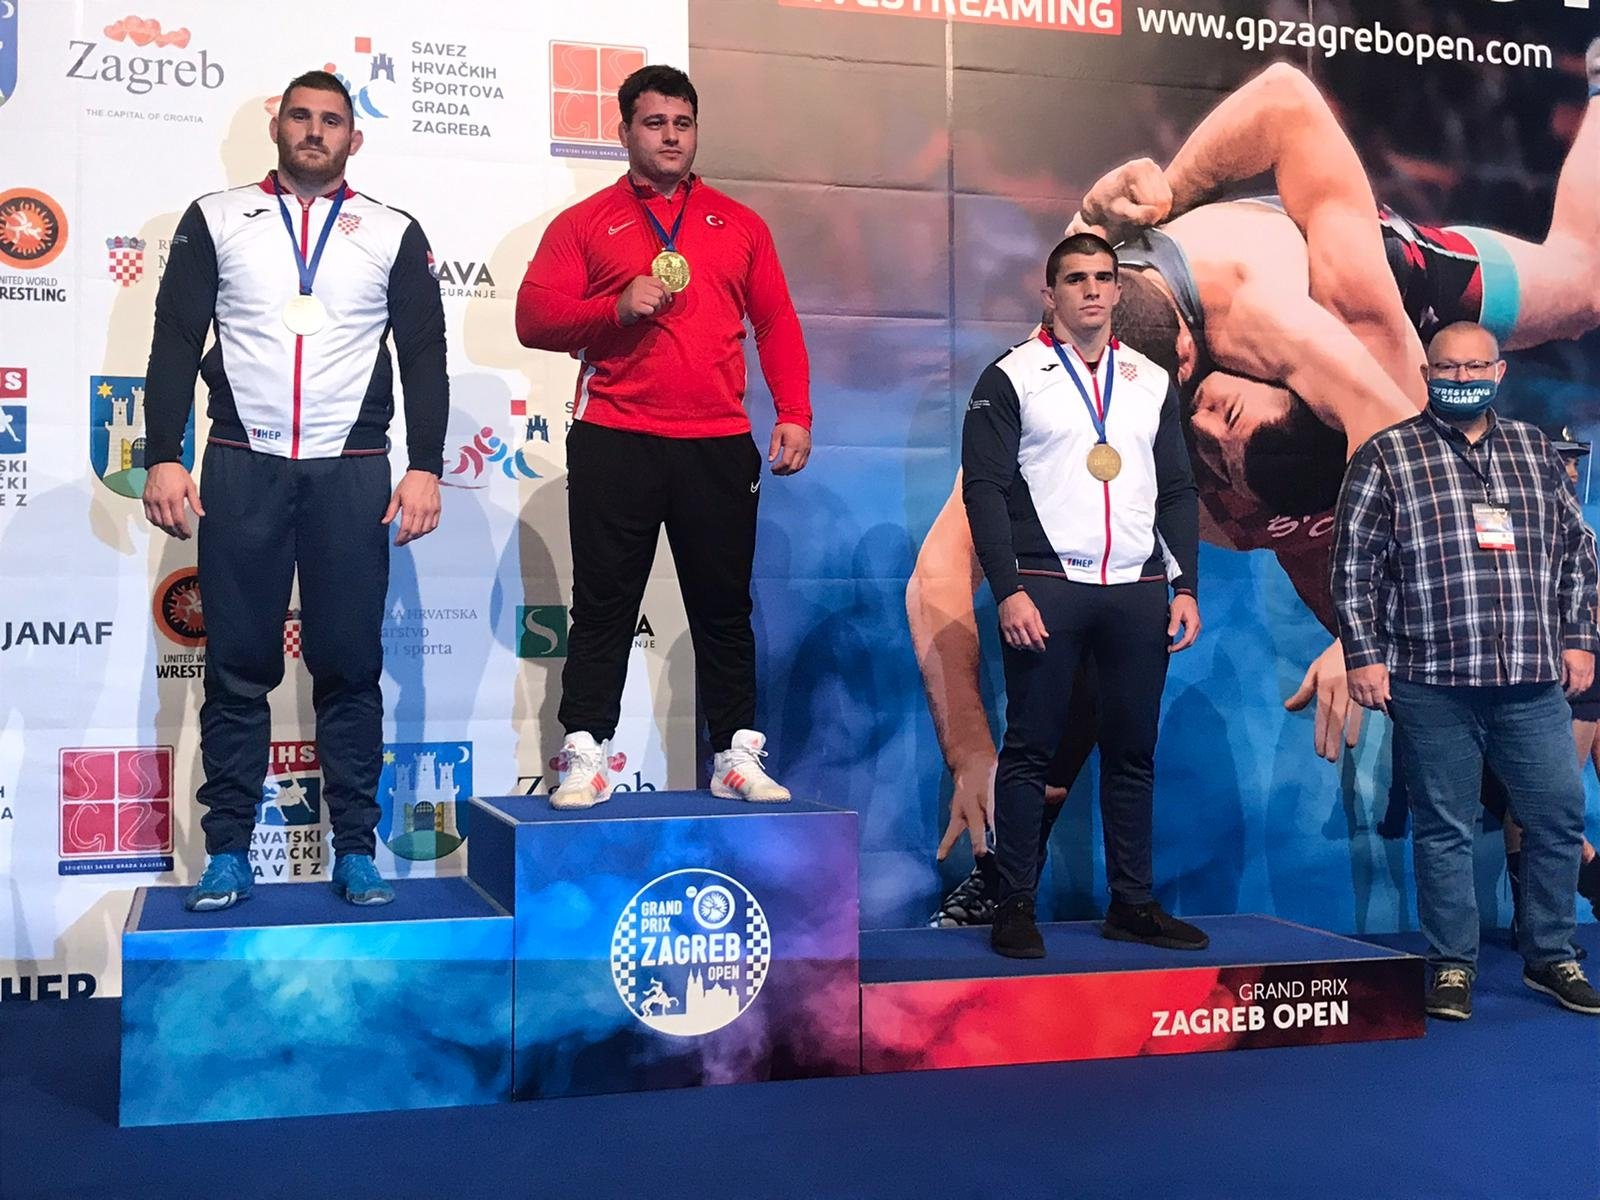 Turkish wrestler Rıza Kayaalp (C) poses with his gold medal in Zagreb, Croatia, Nov. 8, 2020. (AA Photo)